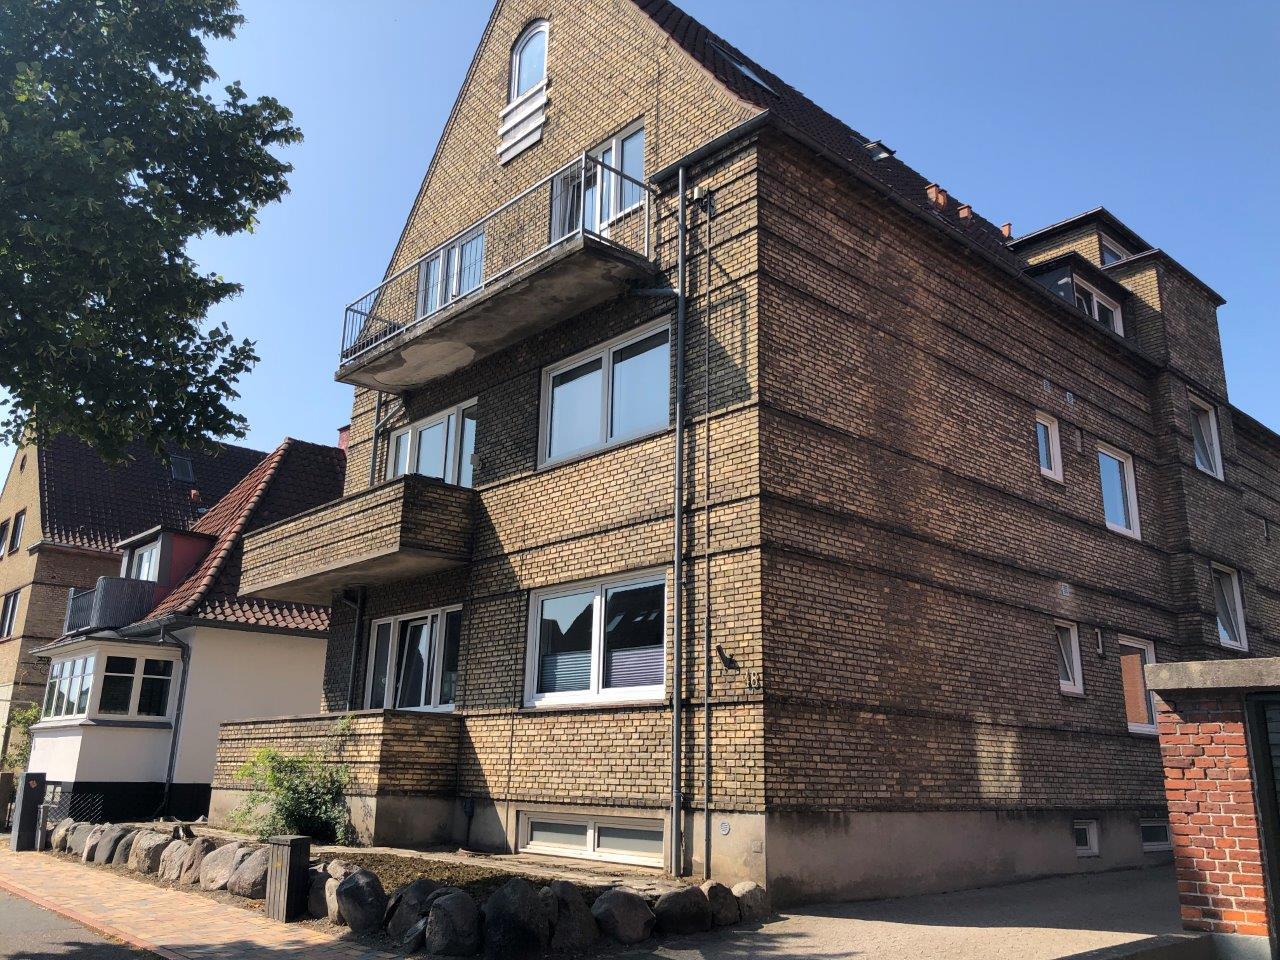 Reventlowsvej 48, 5000 Odense C